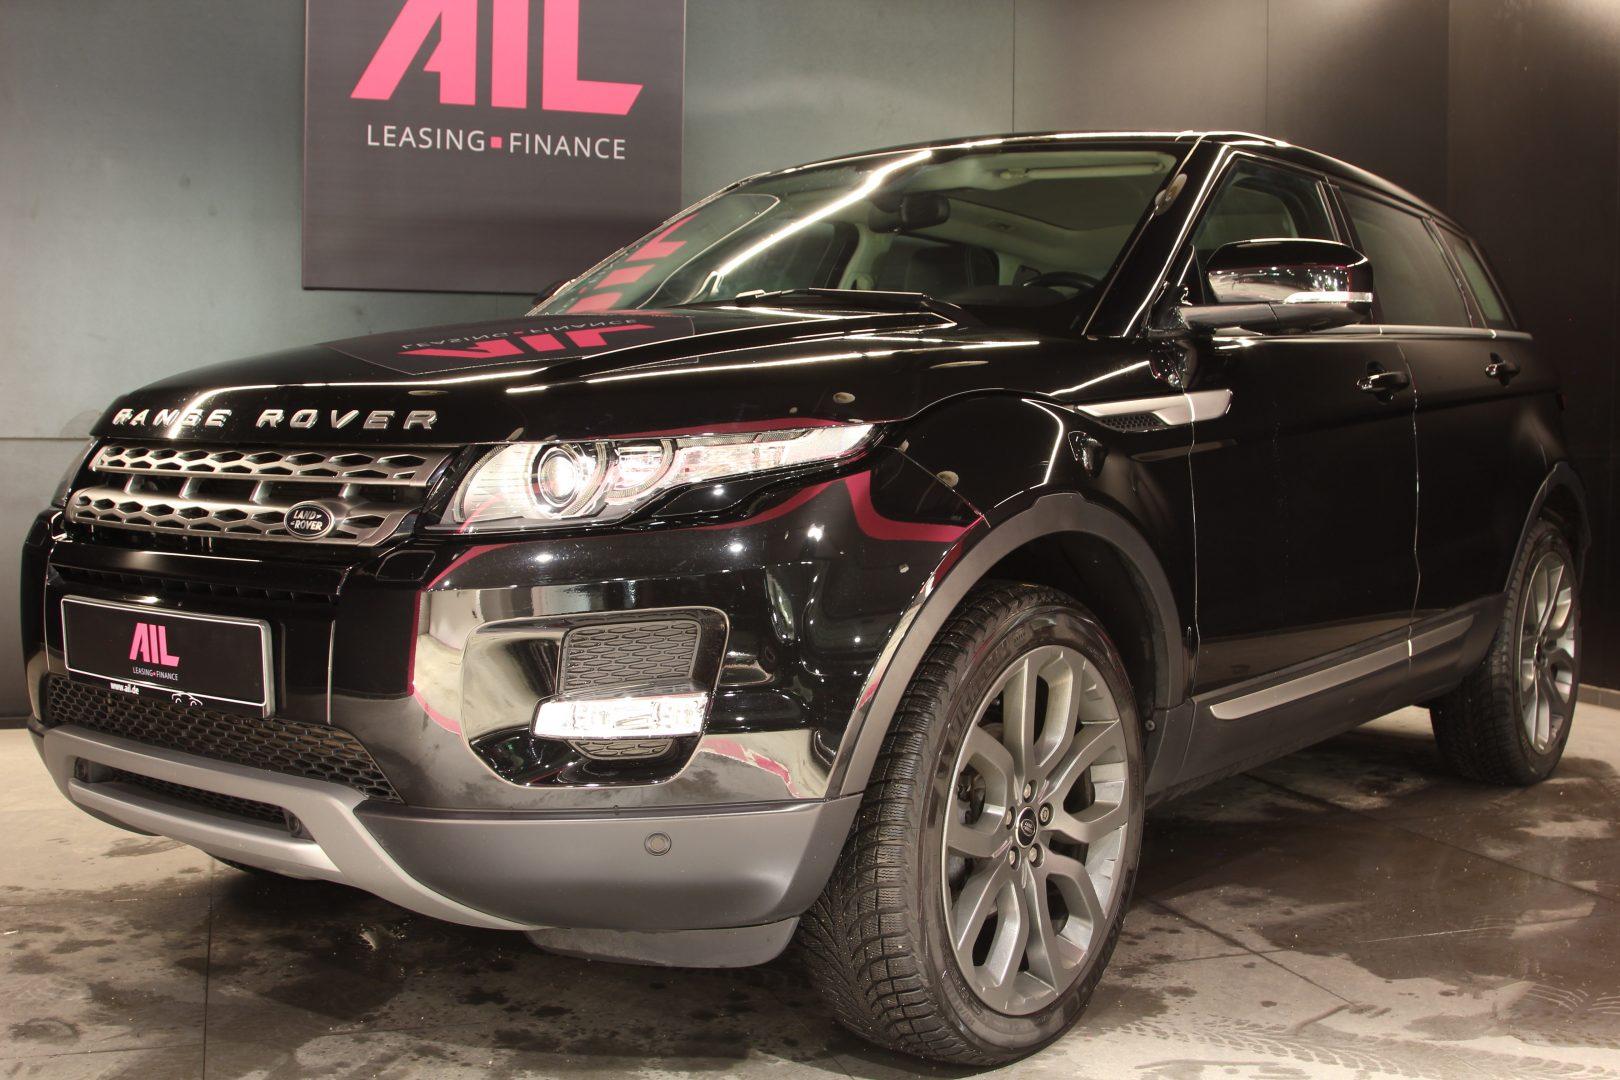 AIL Land Rover Range Rover Evoque Prestige 2